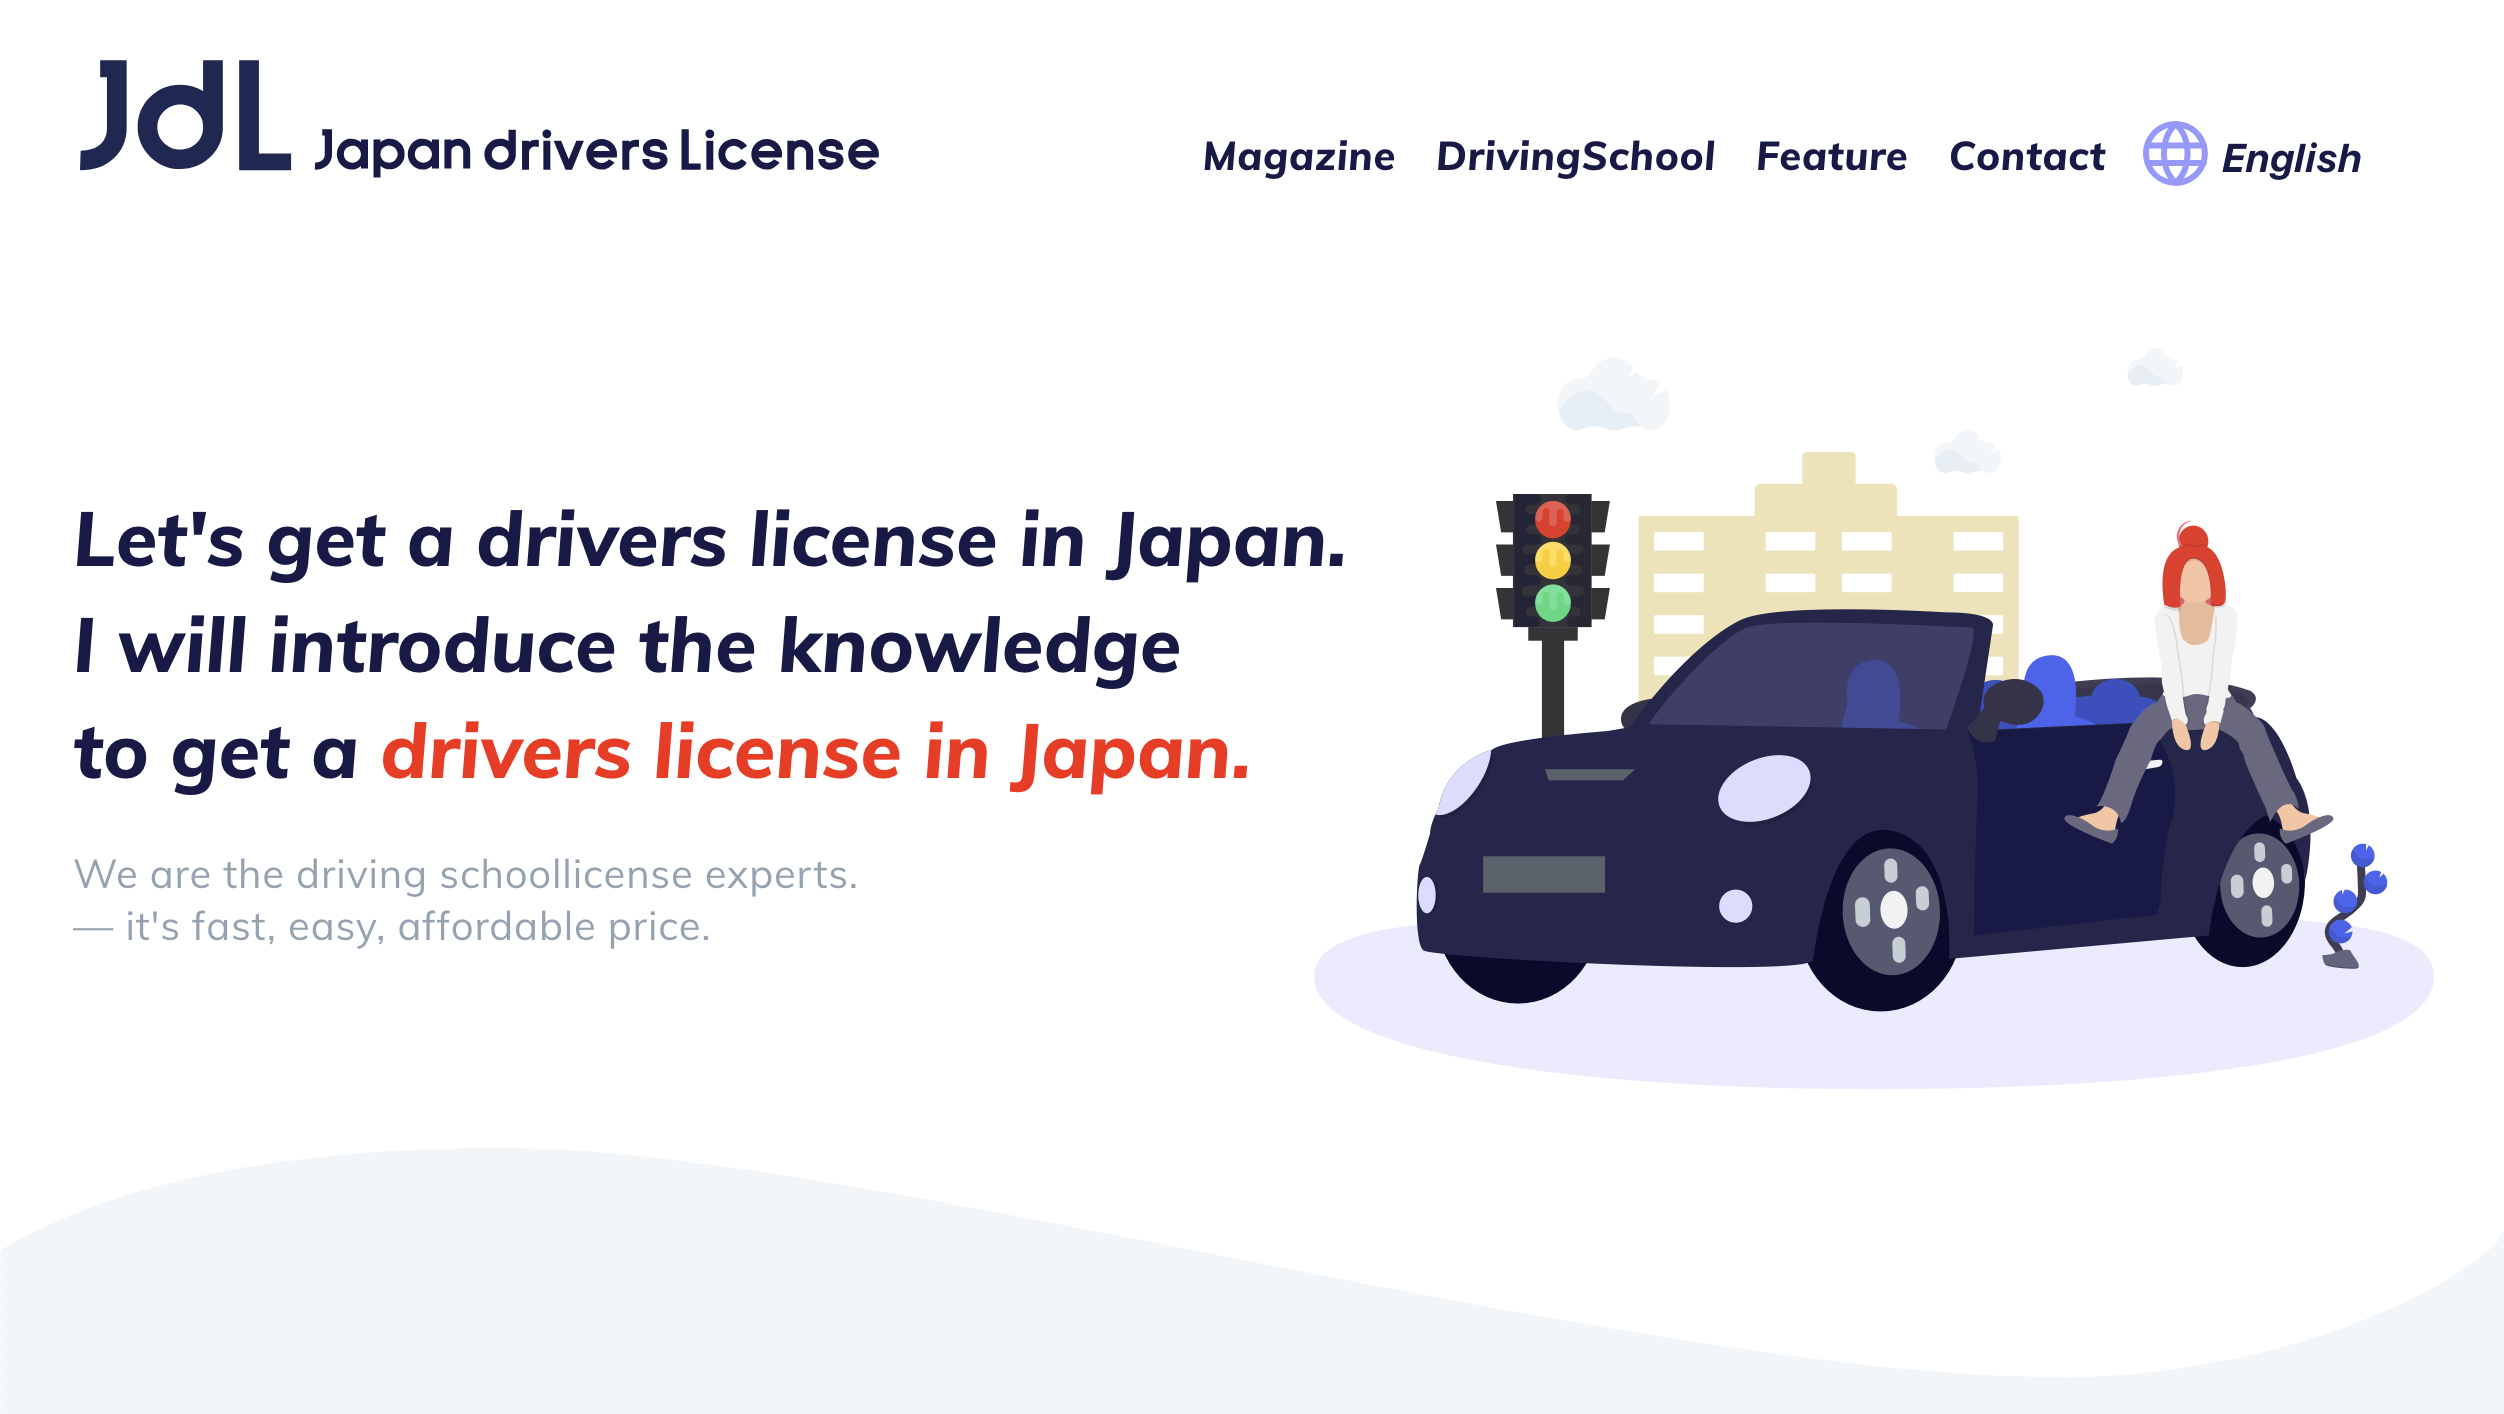 JDL-JapanDriversLicense